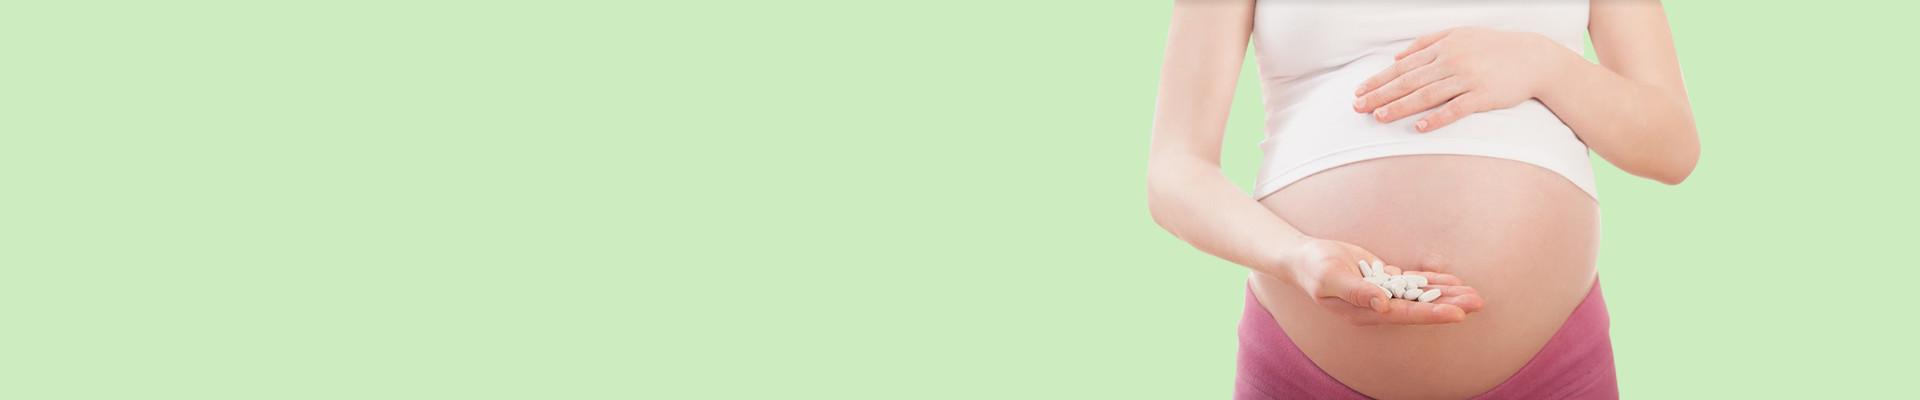 Jual Vitamin Ibu Hamil - Terbaik & Terlengkap